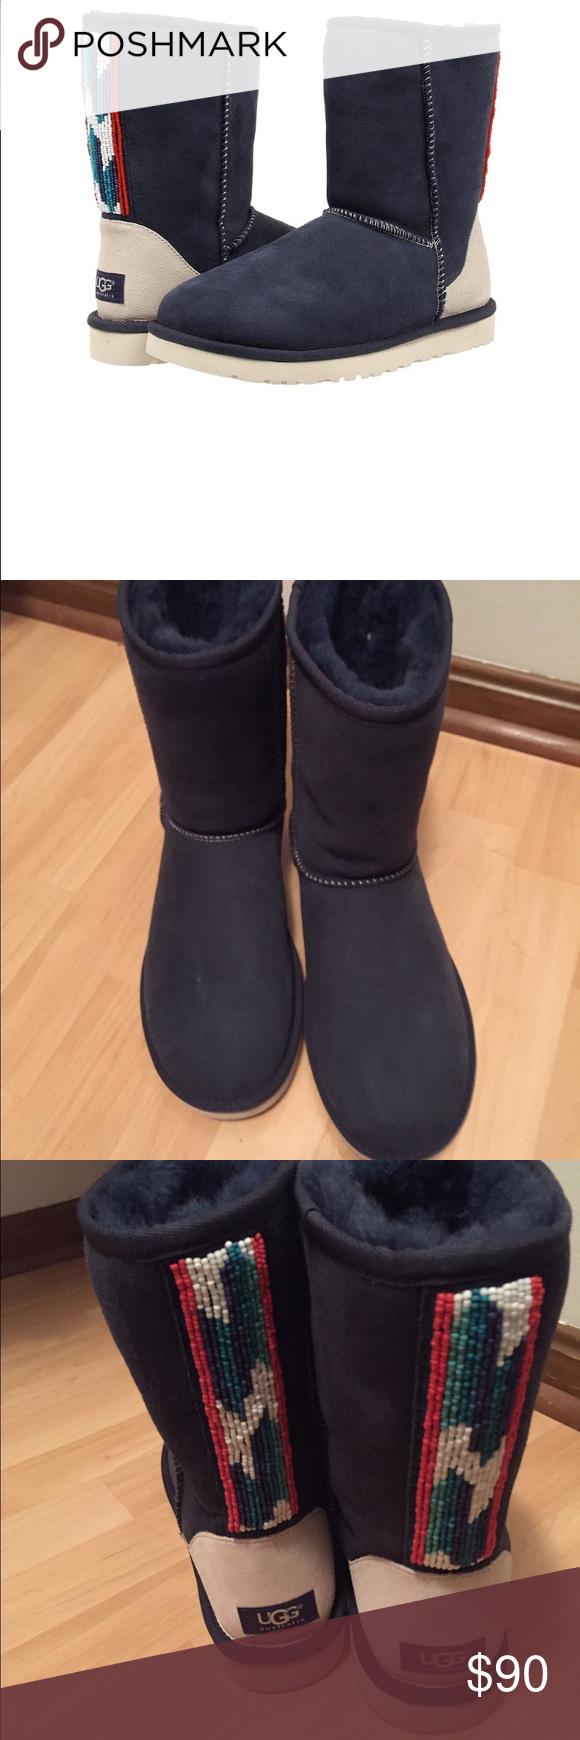 ef495c0ff70 Ugg classic short 10 serape beads boots new blue New, never worn ...